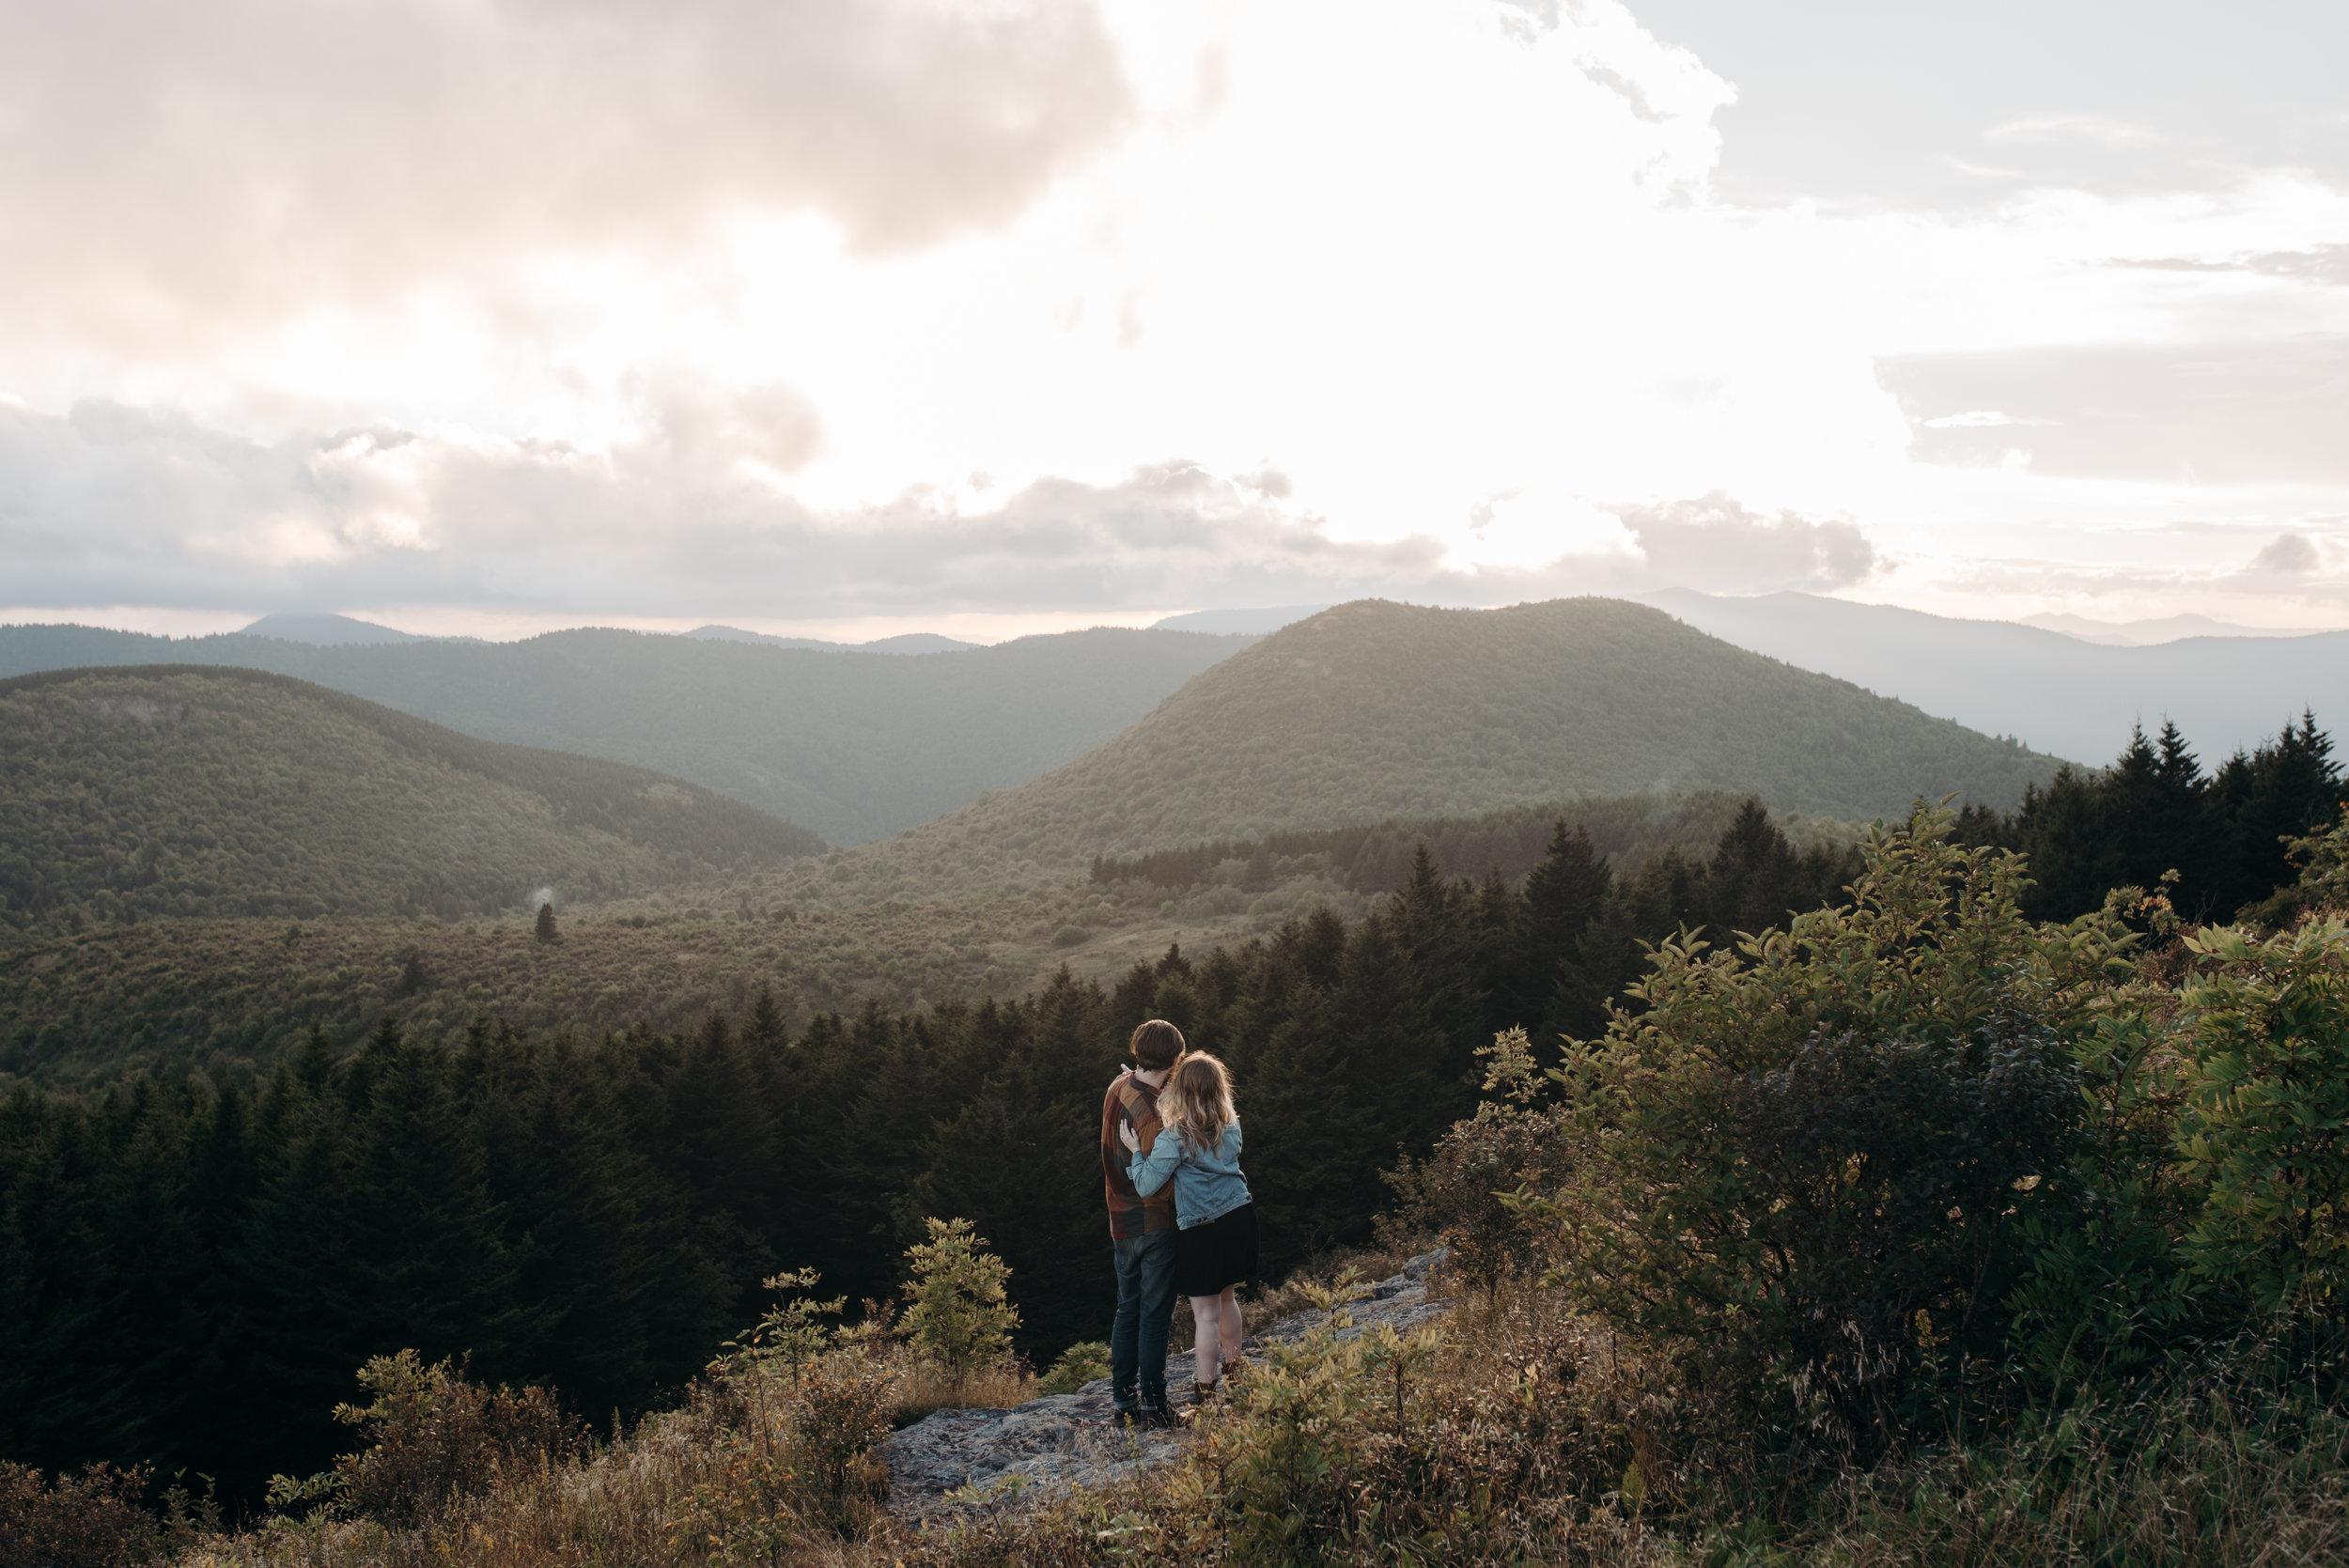 leah-joe-middleton-asheville-north-carolina-couple-session-destination-elopement-photographer-fox-and-film-140.jpg